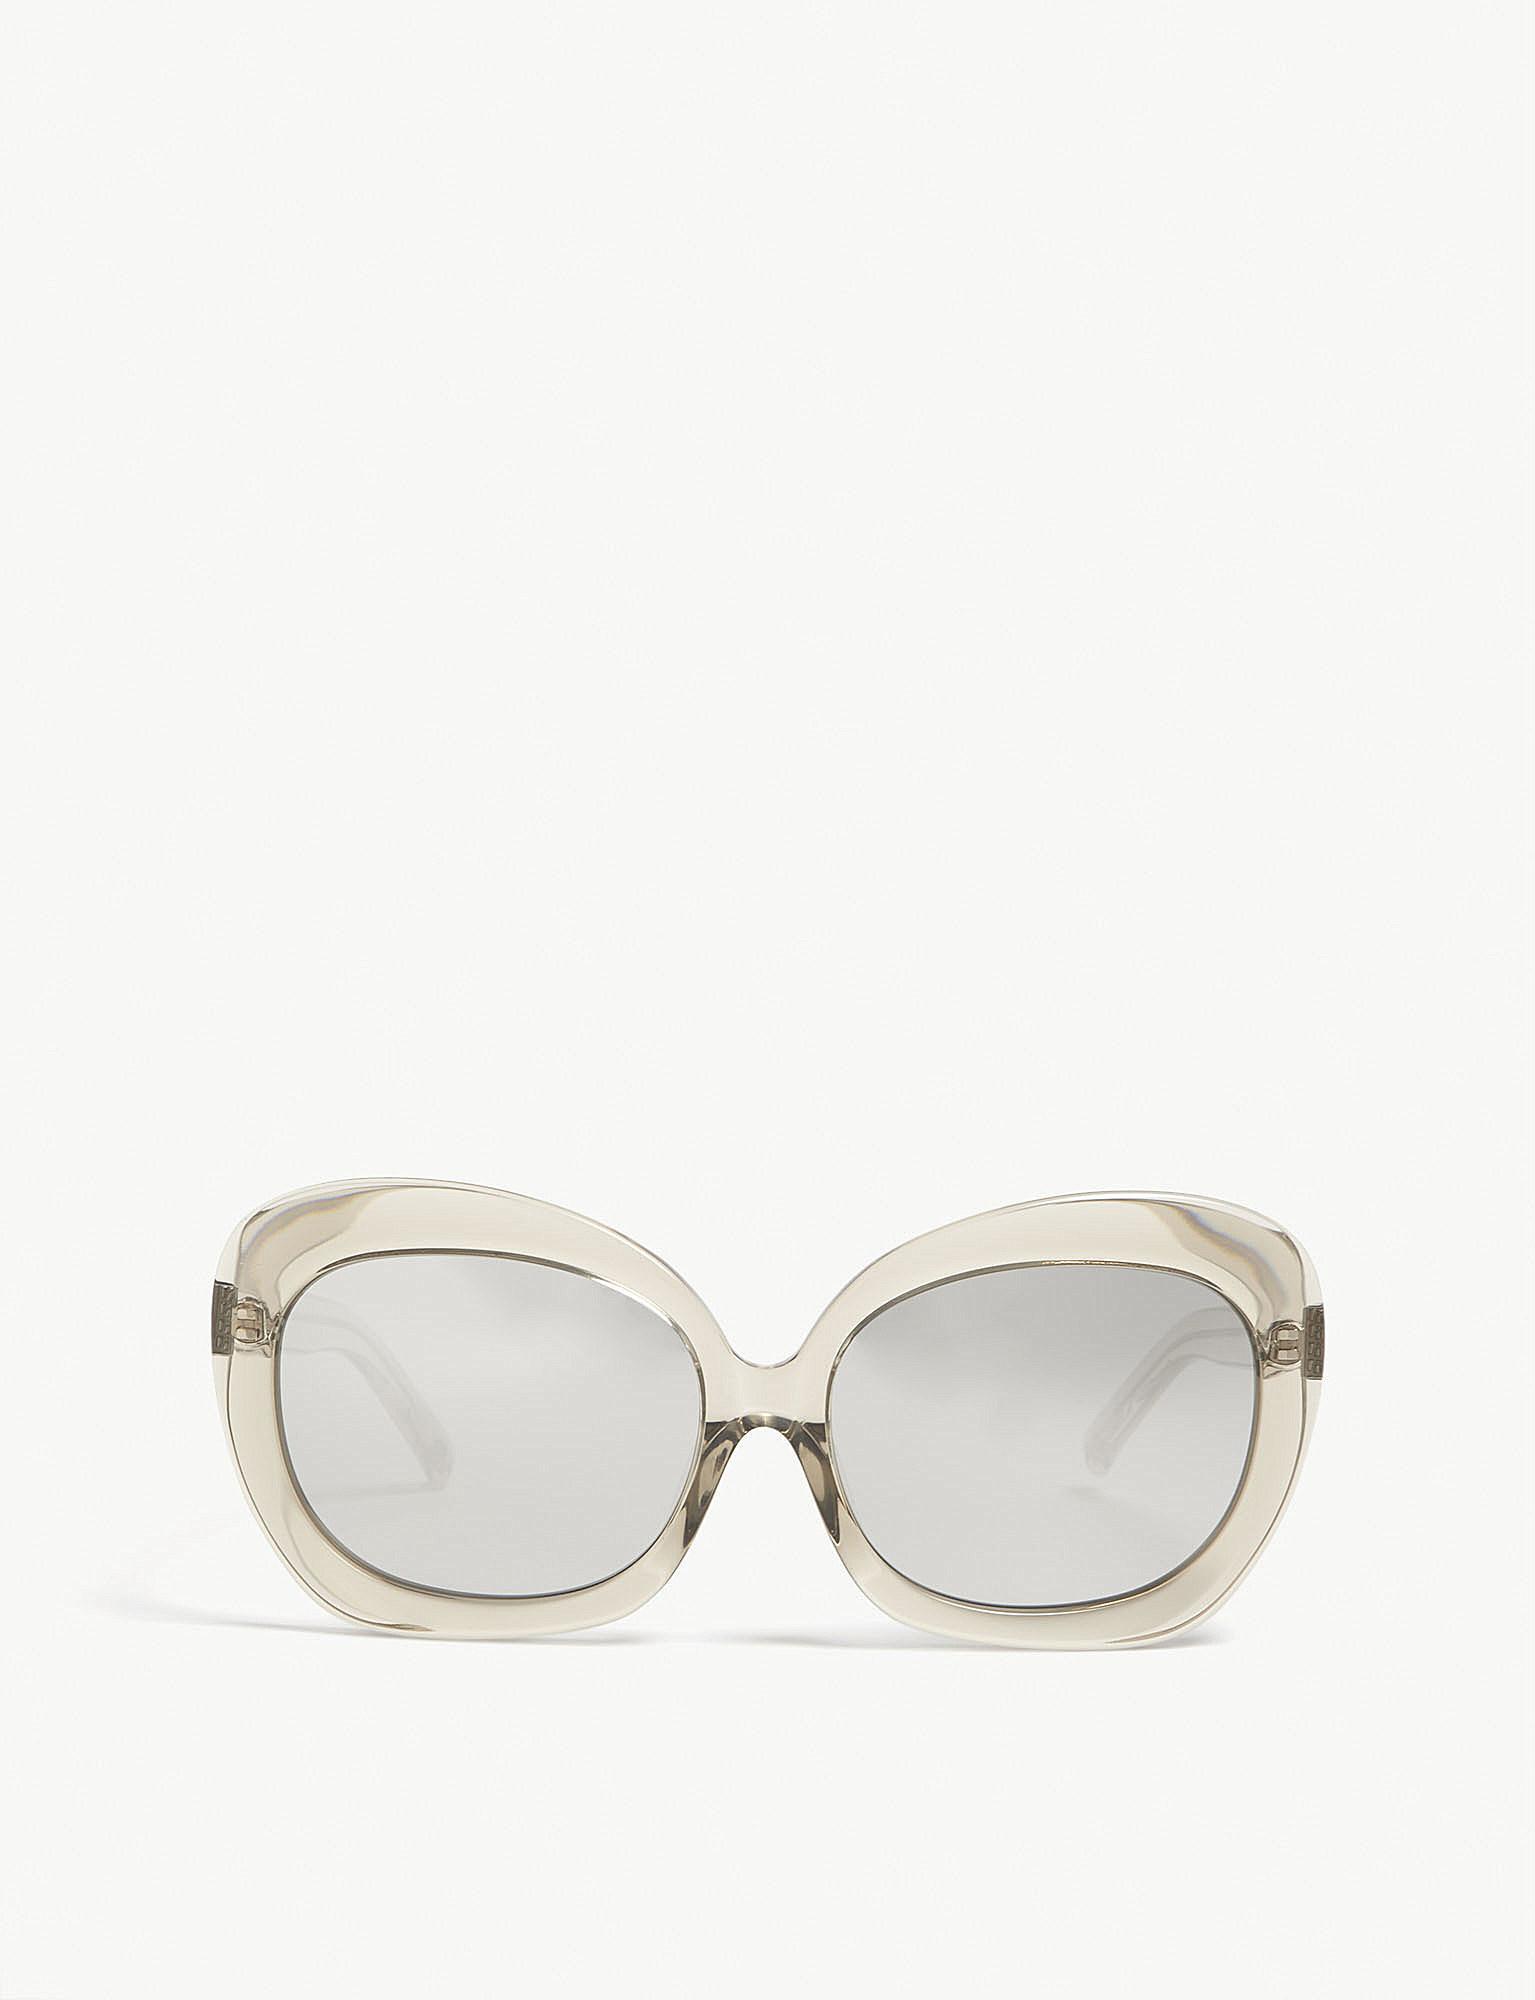 dd3597021a0 Lyst - Linda Farrow Lfl600 Oversized-frame Sunglasses